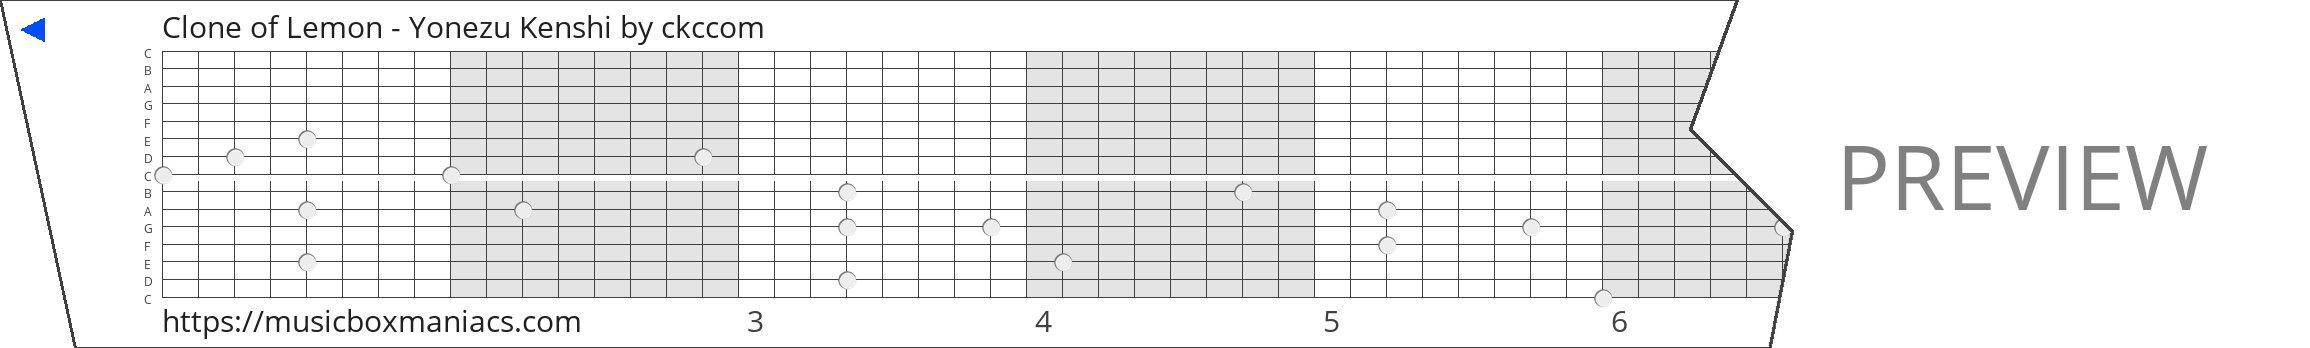 Clone of Lemon - Yonezu Kenshi 15 note music box paper strip